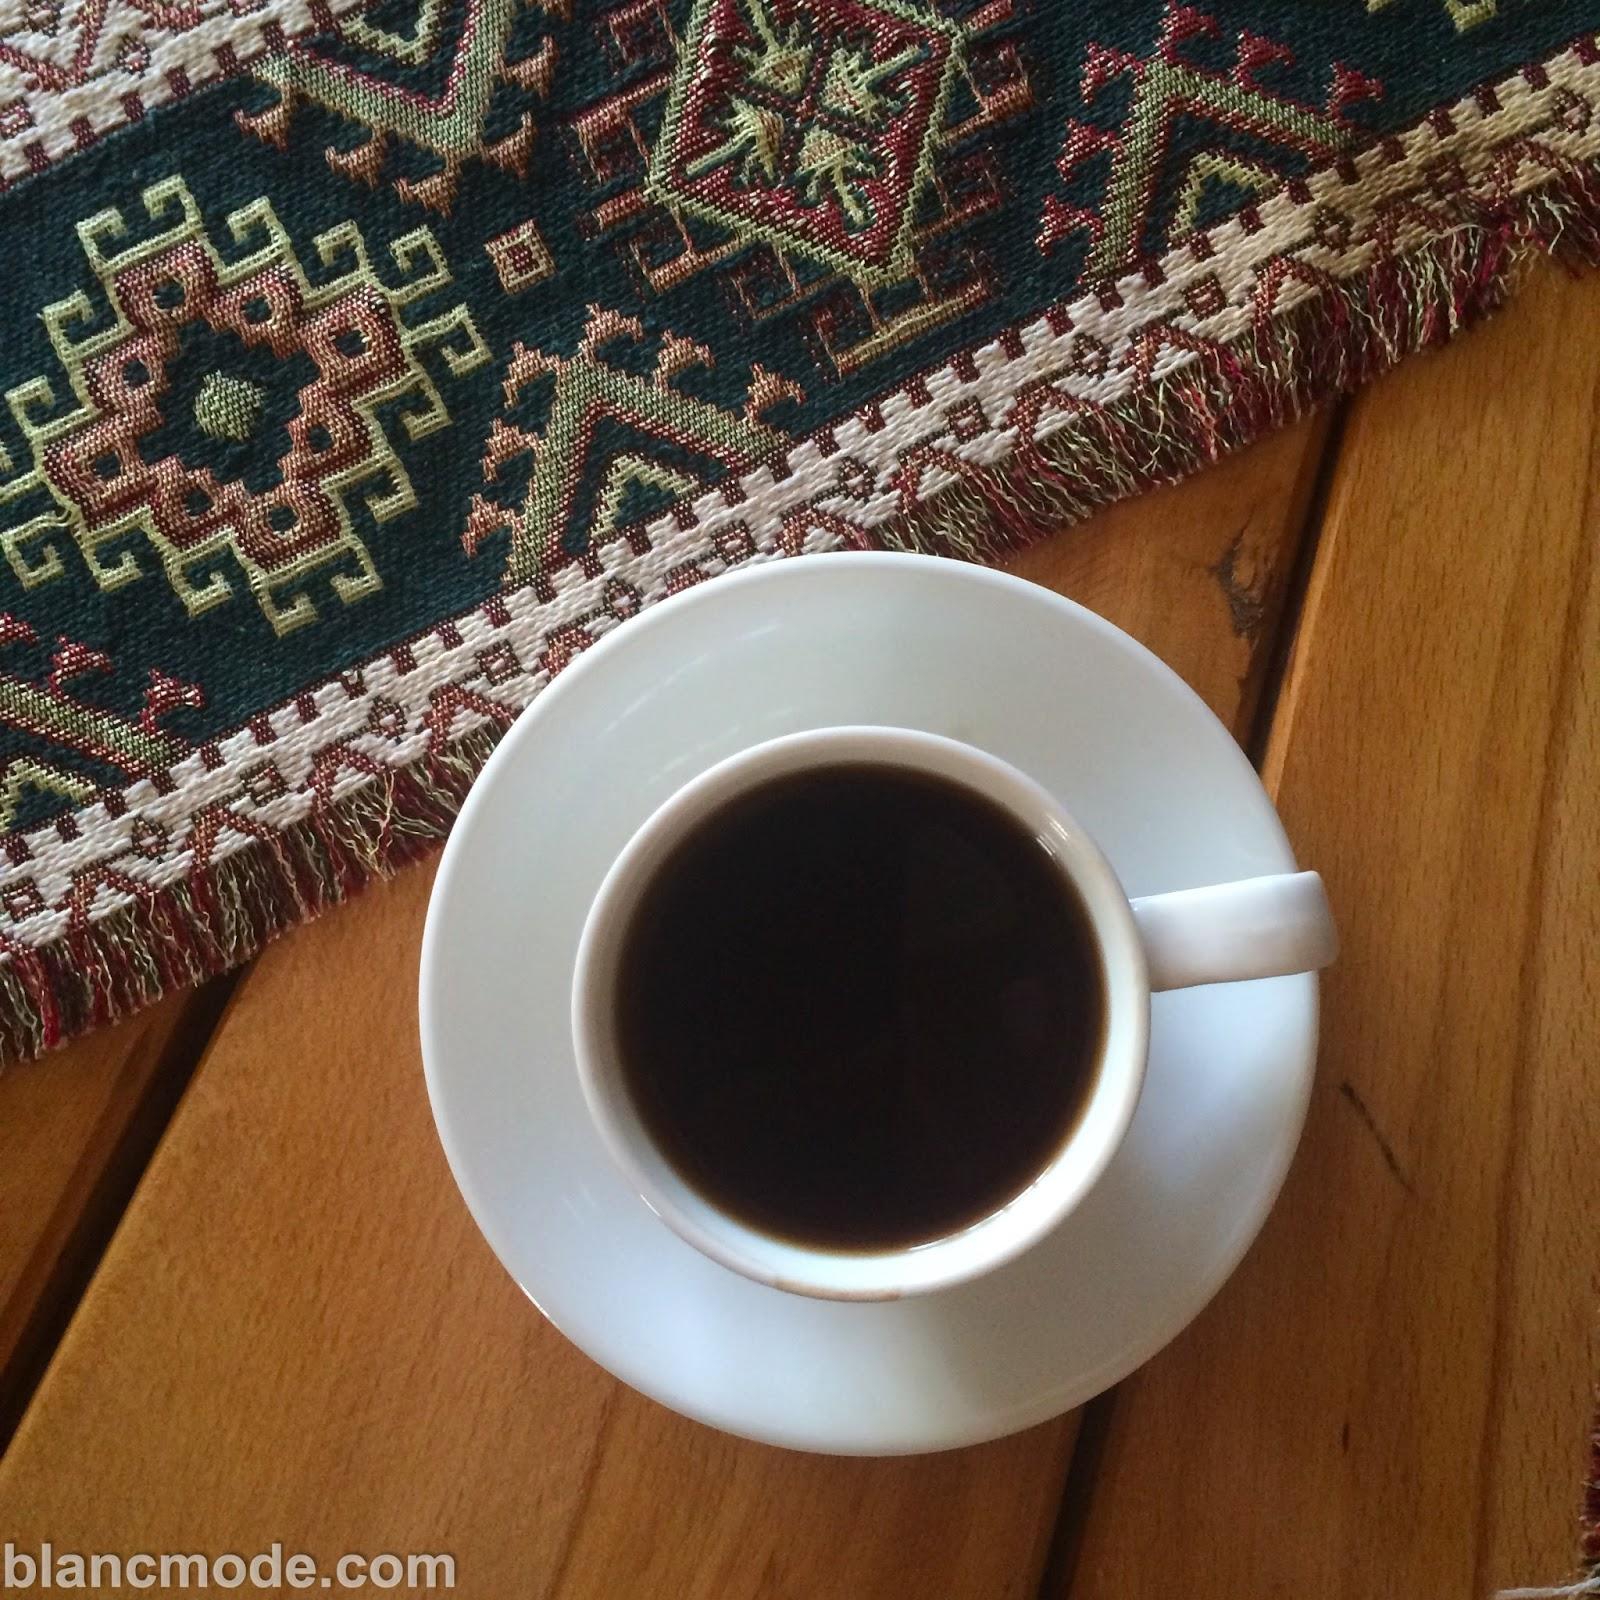 armenian coffee at areni winery